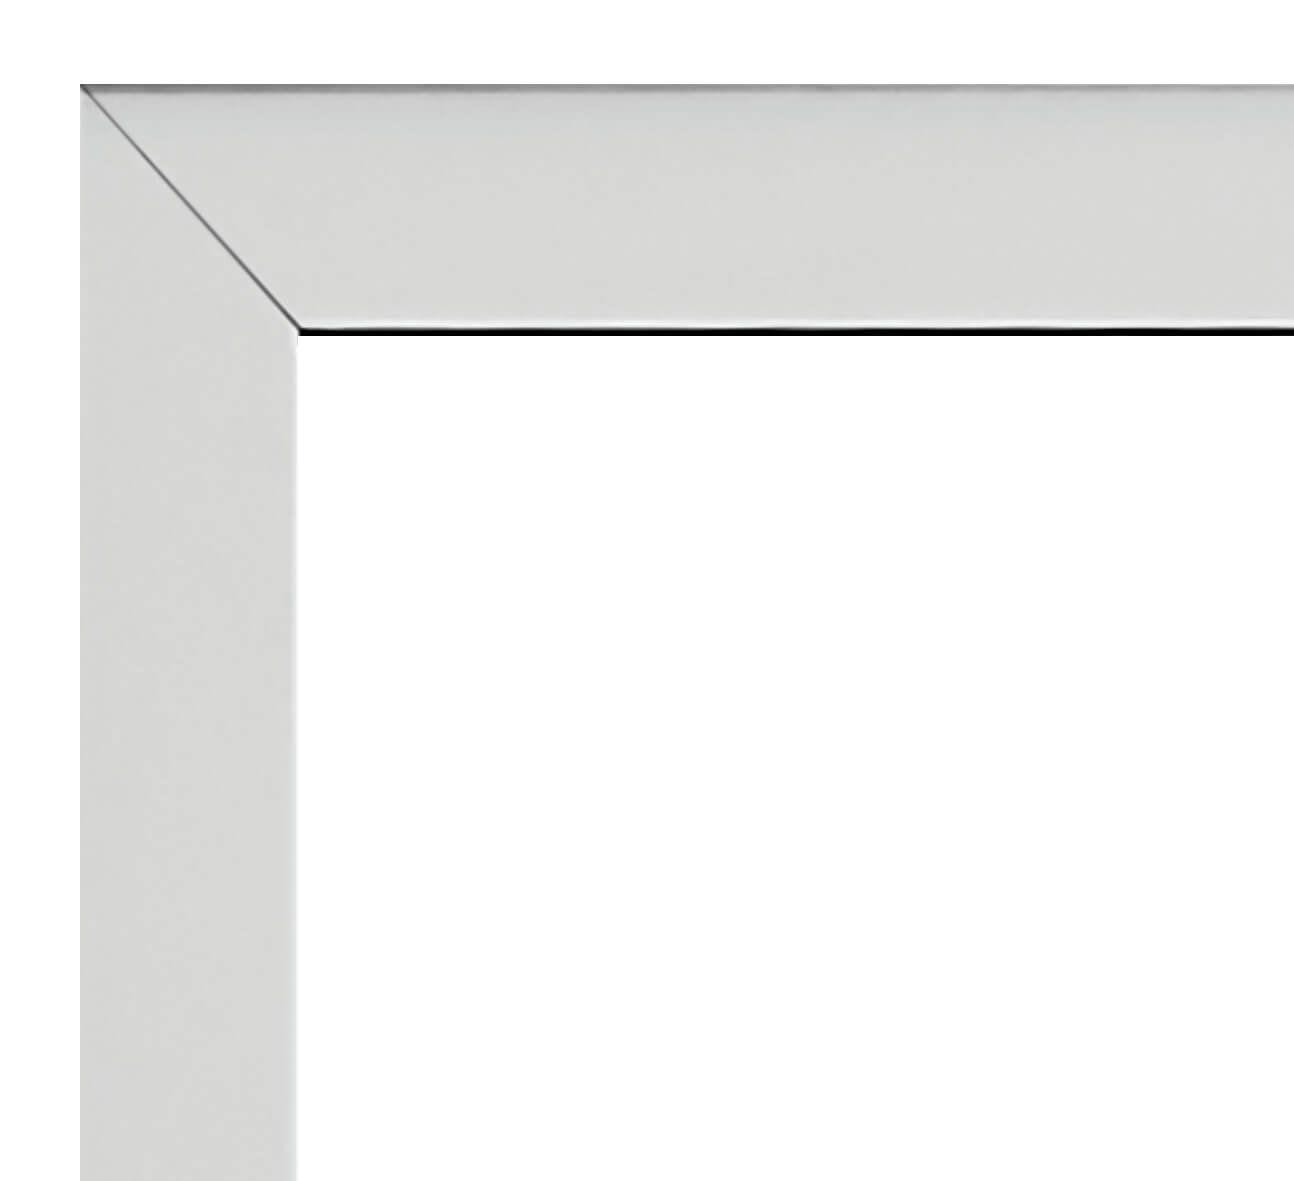 Aluminium Guarnição - 2.18x2.00 Ref. 74.92.663-0 Sasazaki